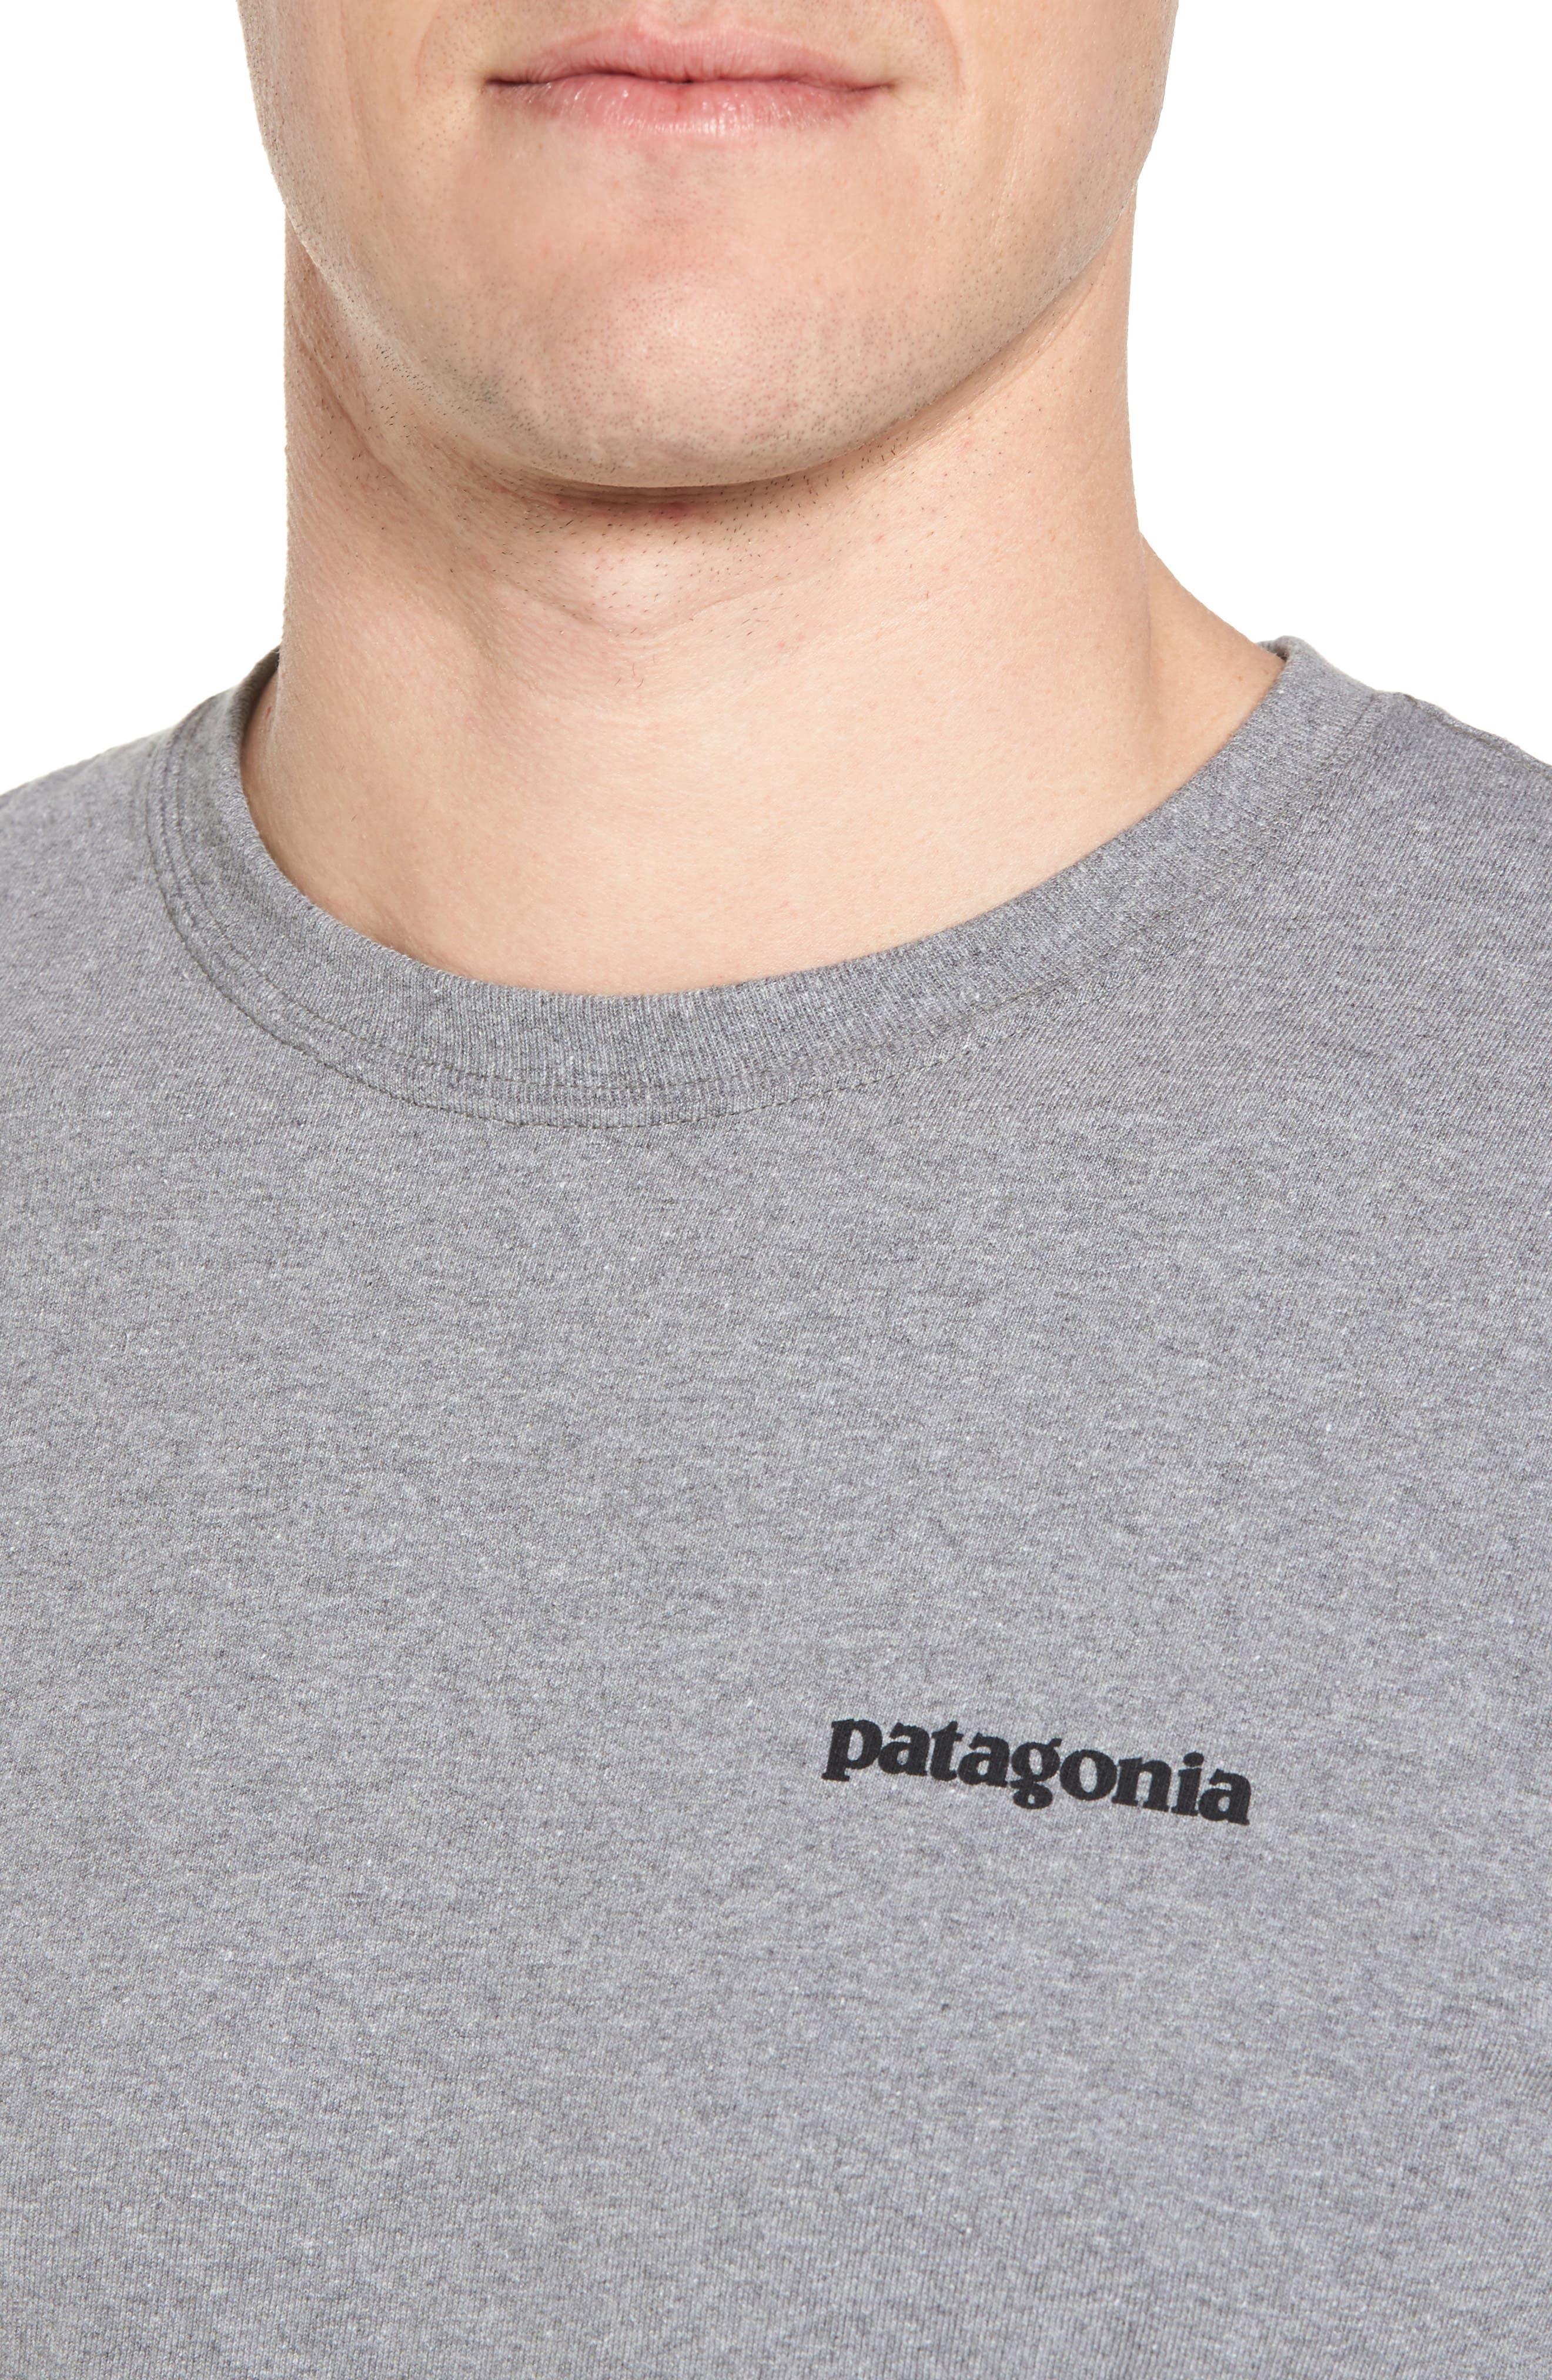 PATAGONIA, Responsibili-Tee T-Shirt, Alternate thumbnail 4, color, GRAVEL HEATHER